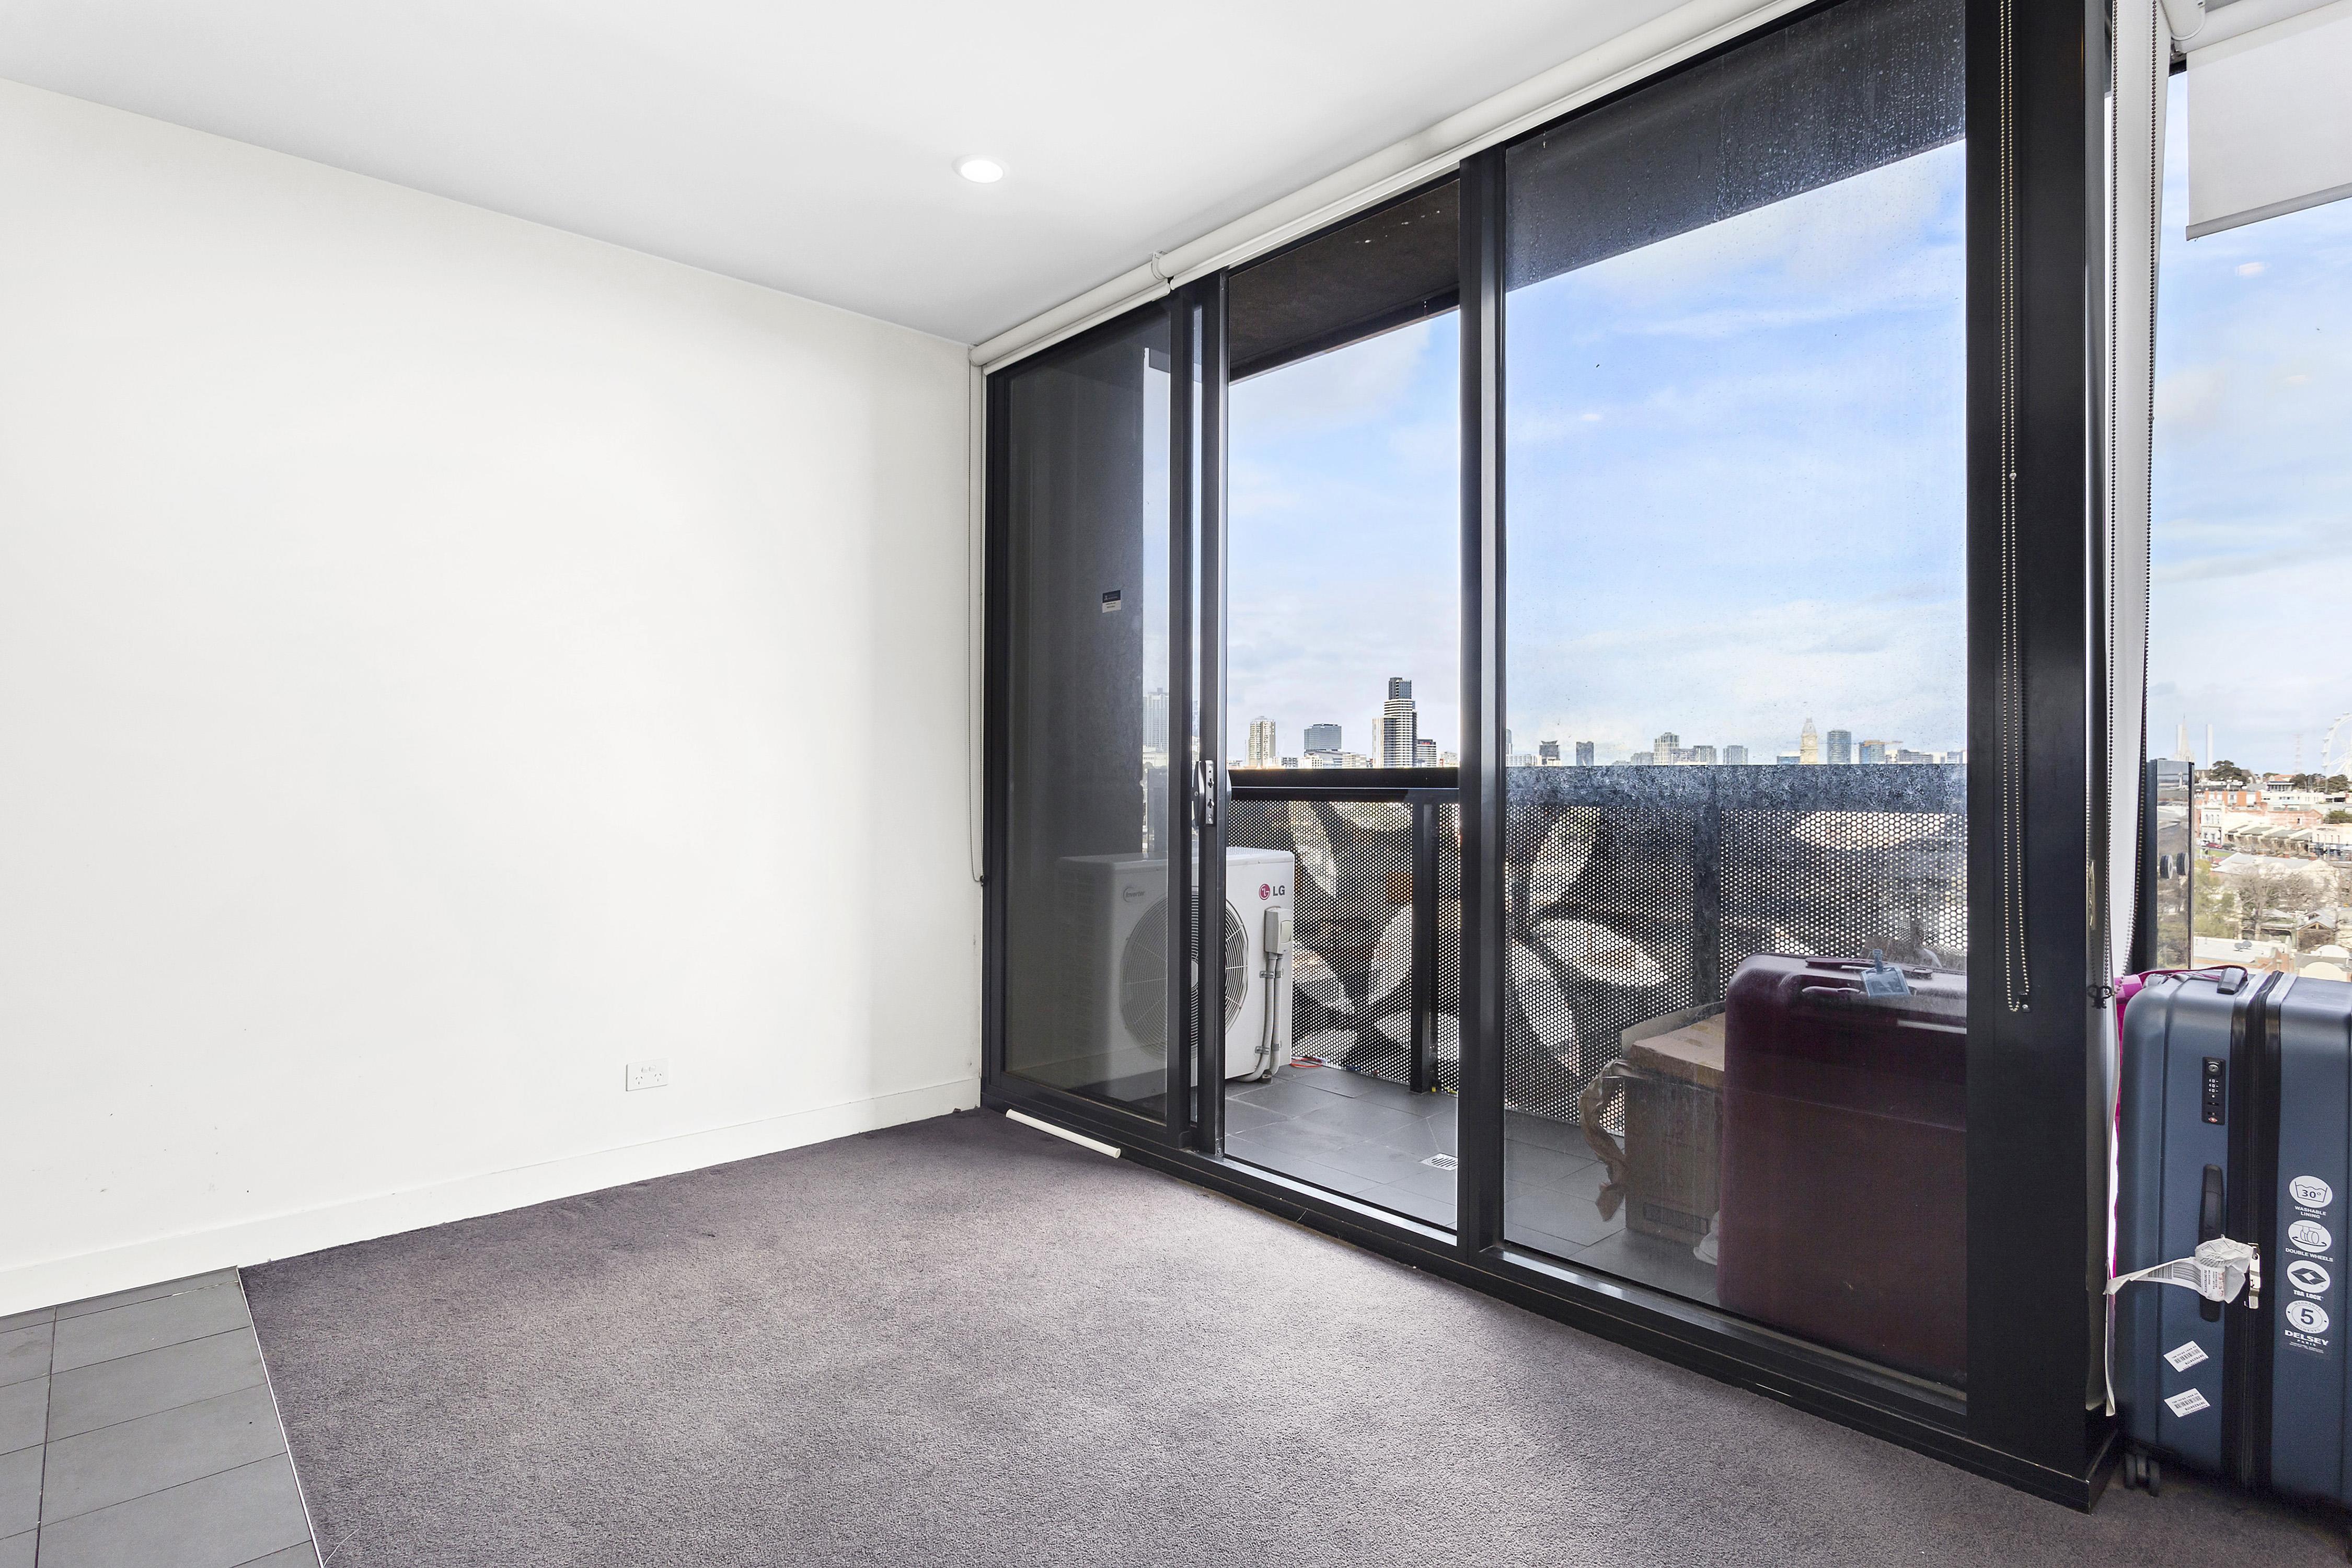 108-97-flemington-road-north-melbourne-student-accommodation-Melbourne-Bedroom-1-Unilodgers